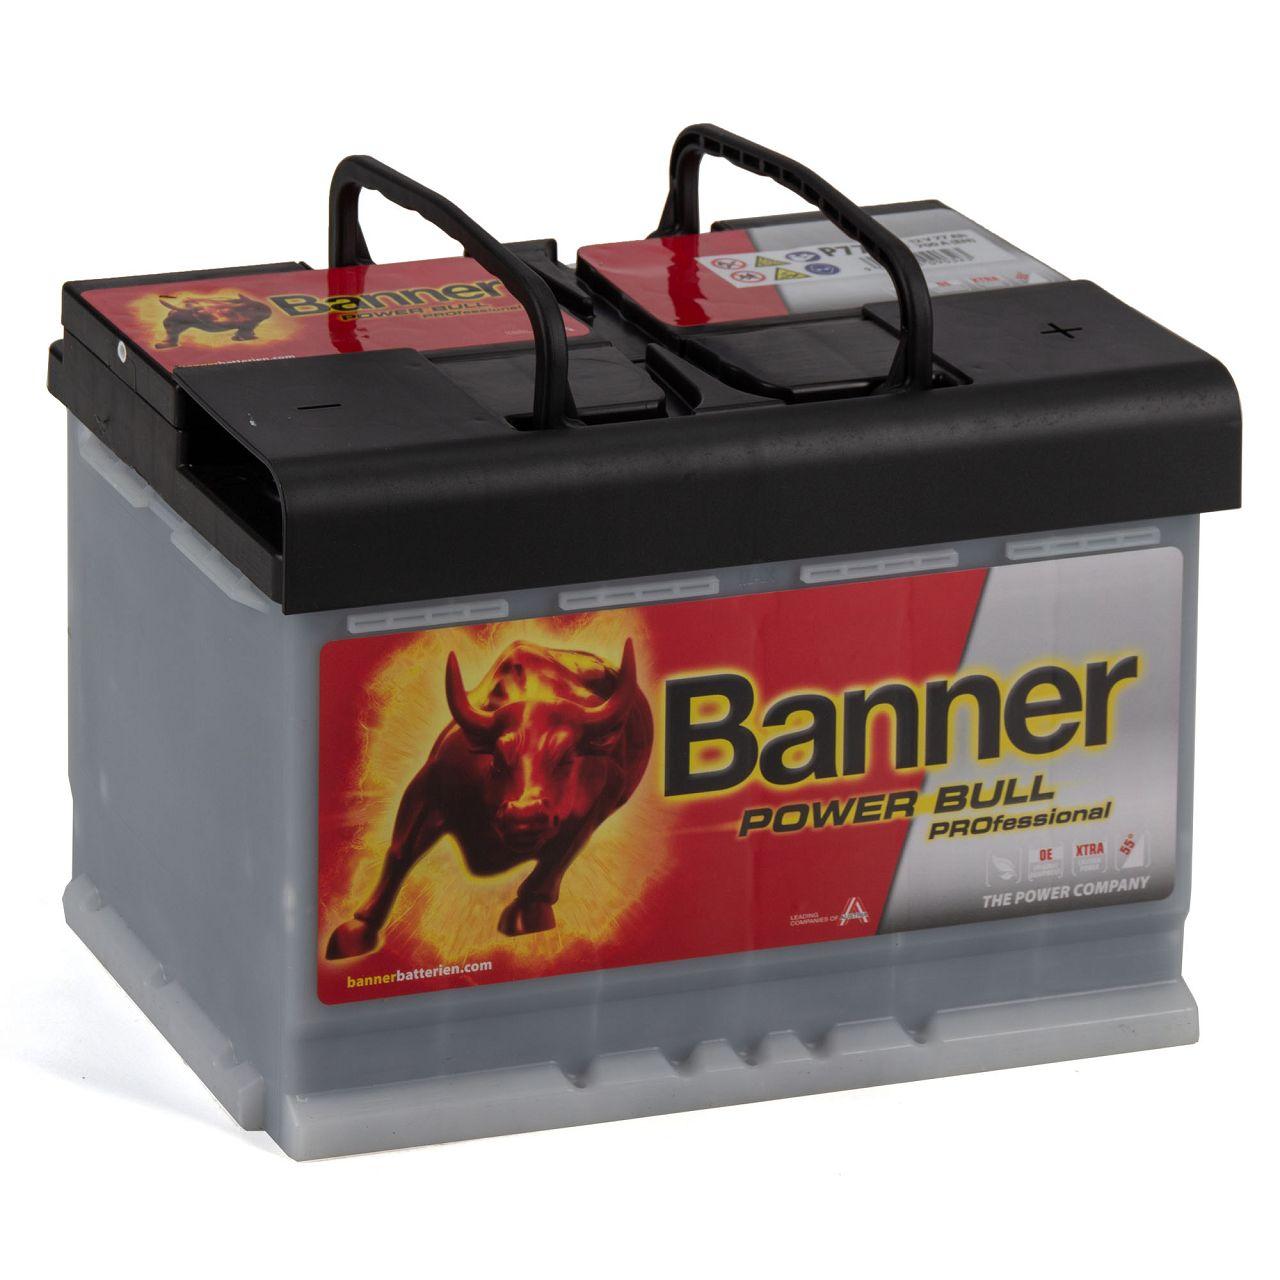 BANNER PROP7740 PRO P7740 Power Bull Professional Autobatterie Batterie 12V 77Ah